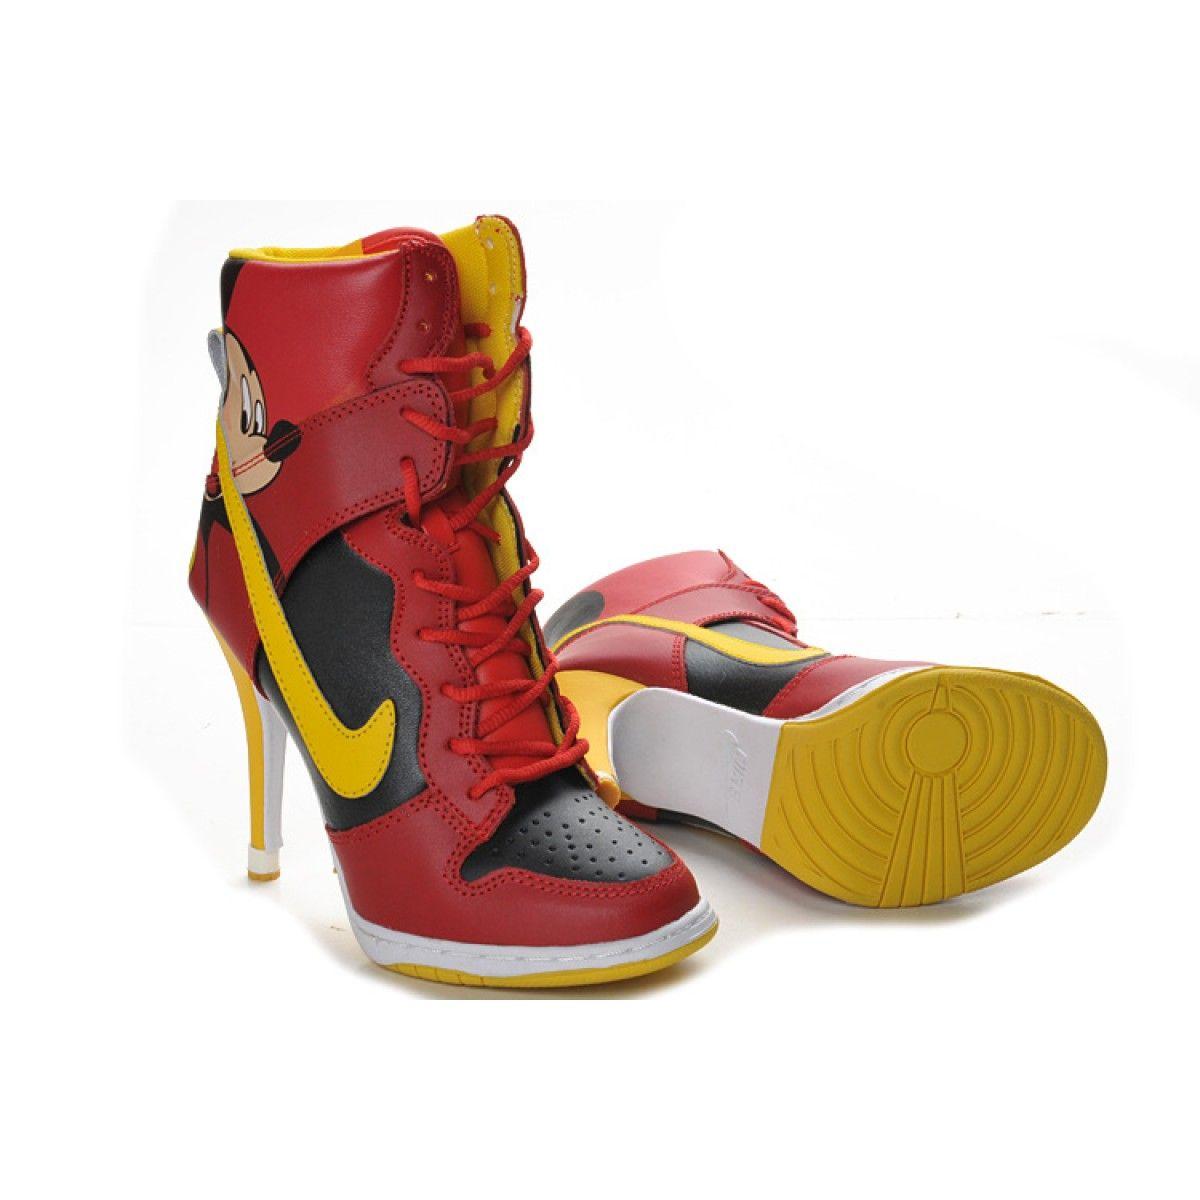 c5166cc964a cartoon High Tops | Home Nike High Top Heels Cartoon Boots Micky Red ...